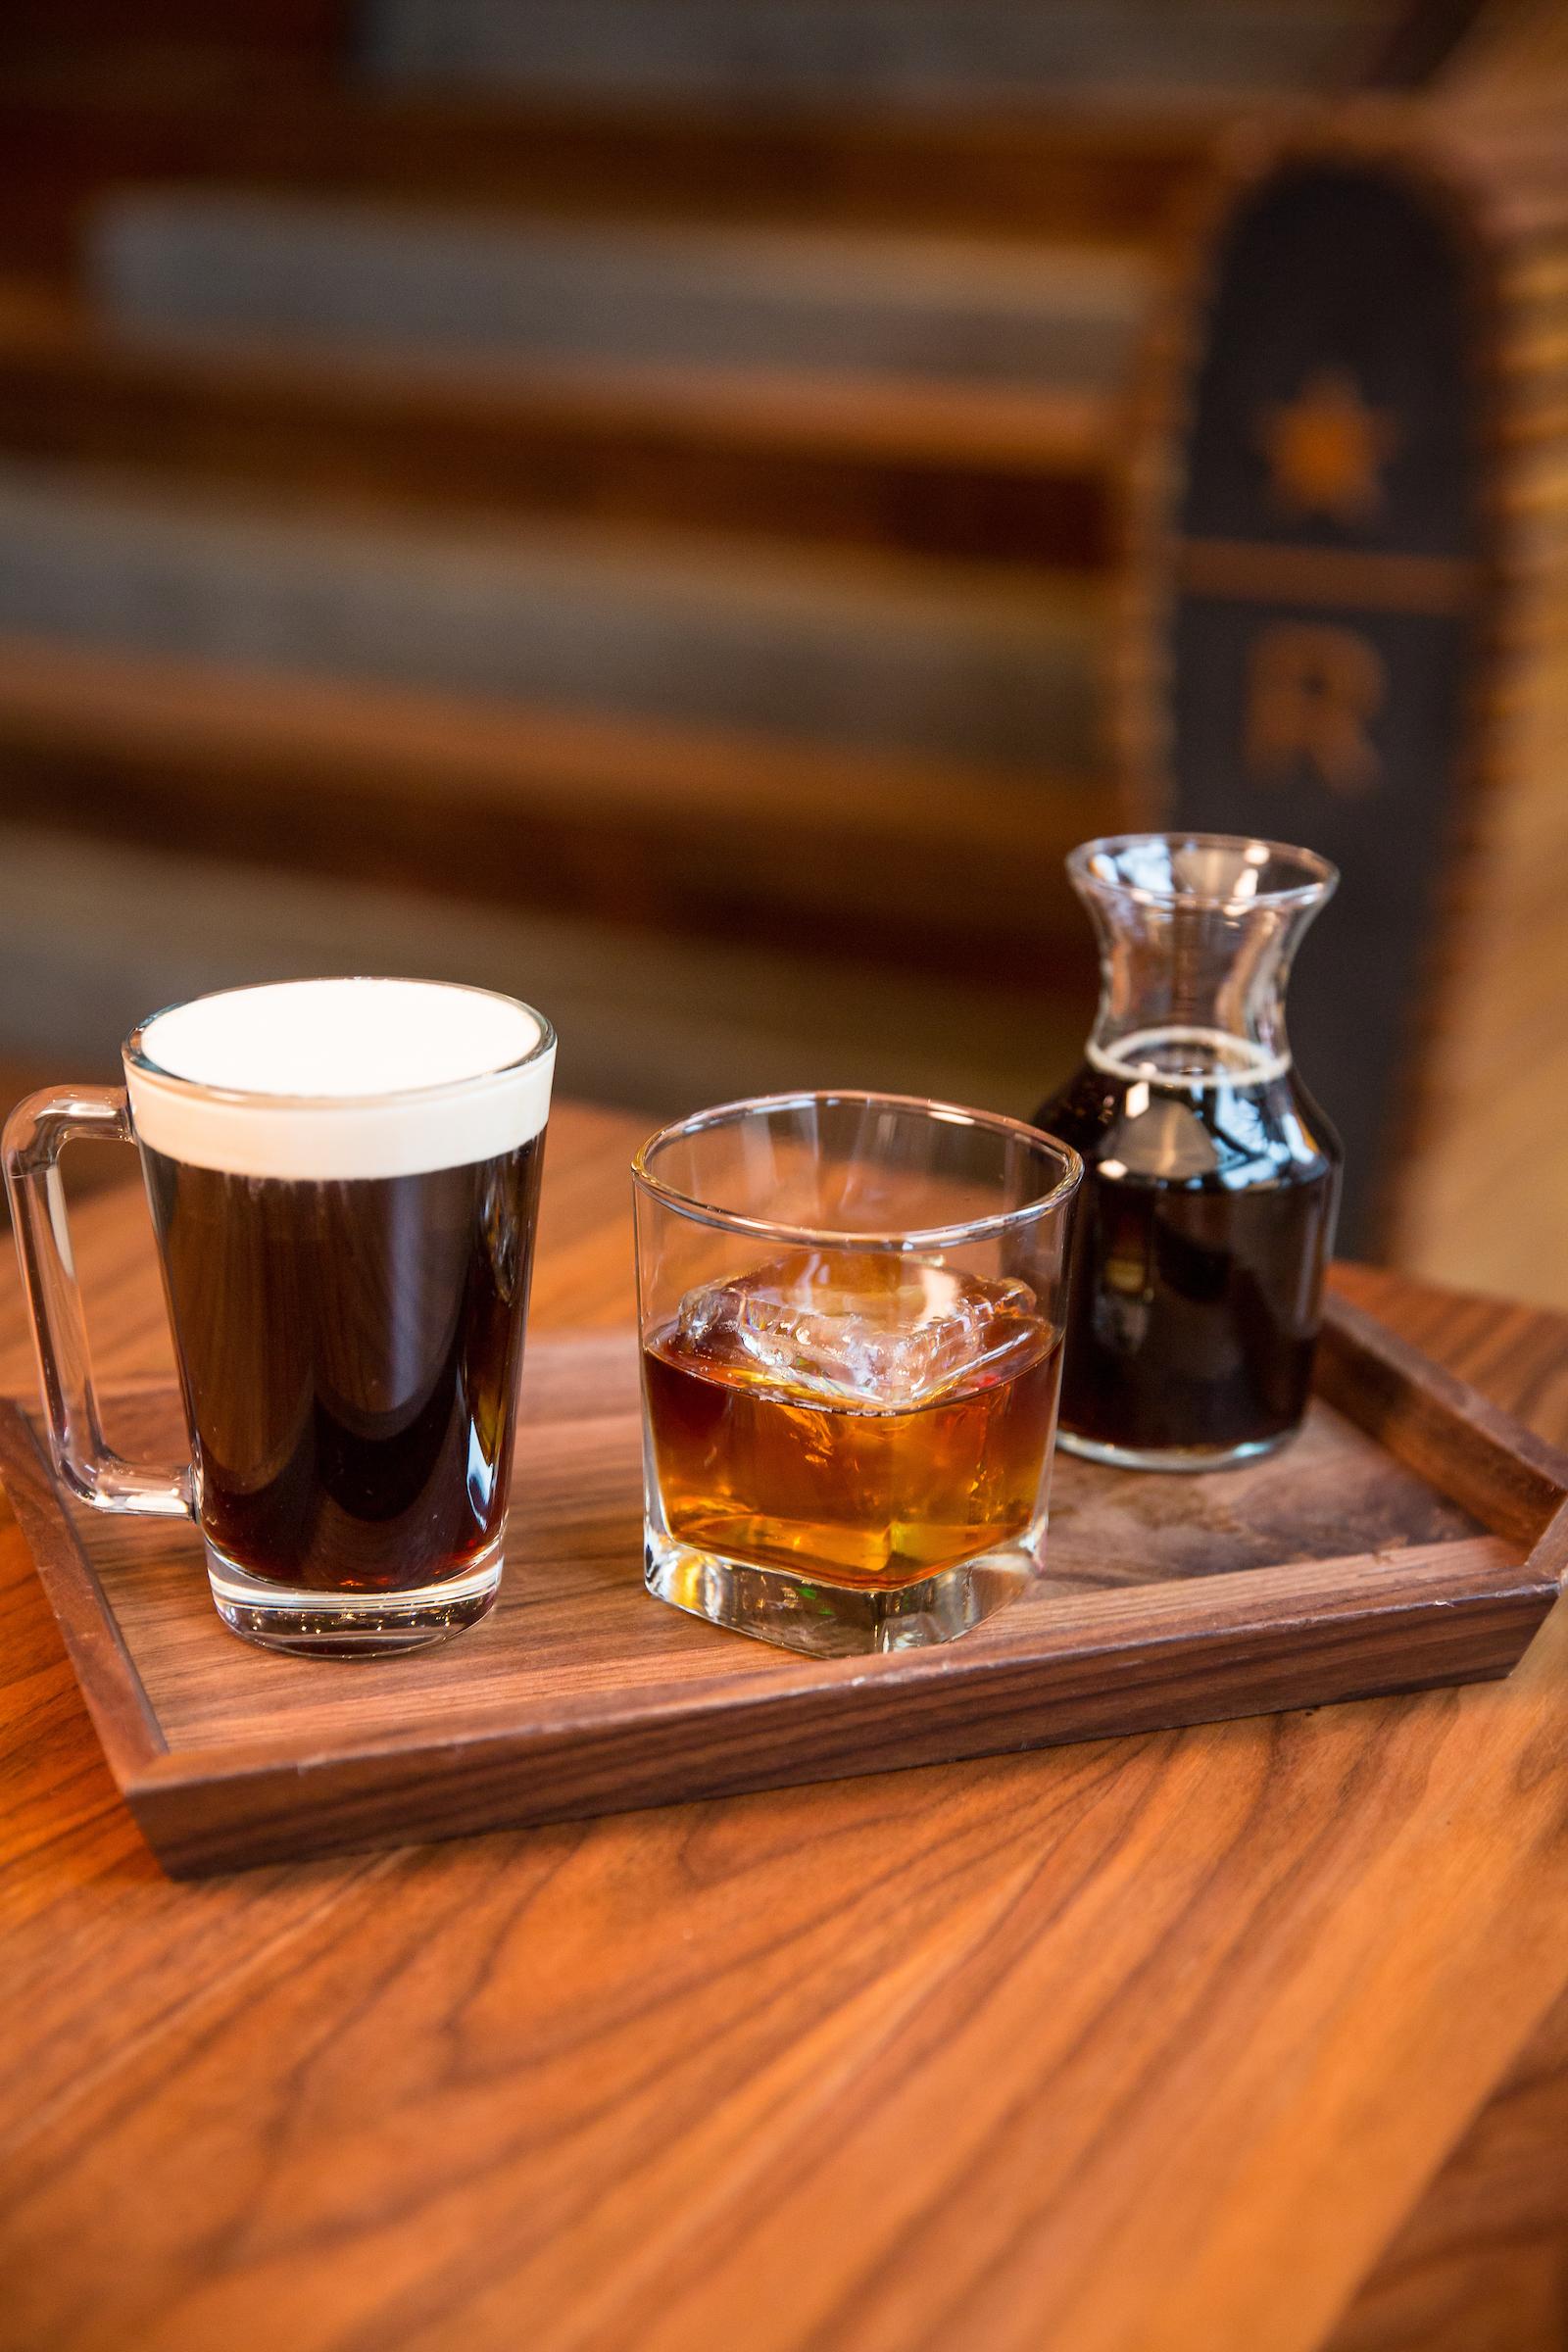 Starbucks' new barrel-aged coffee